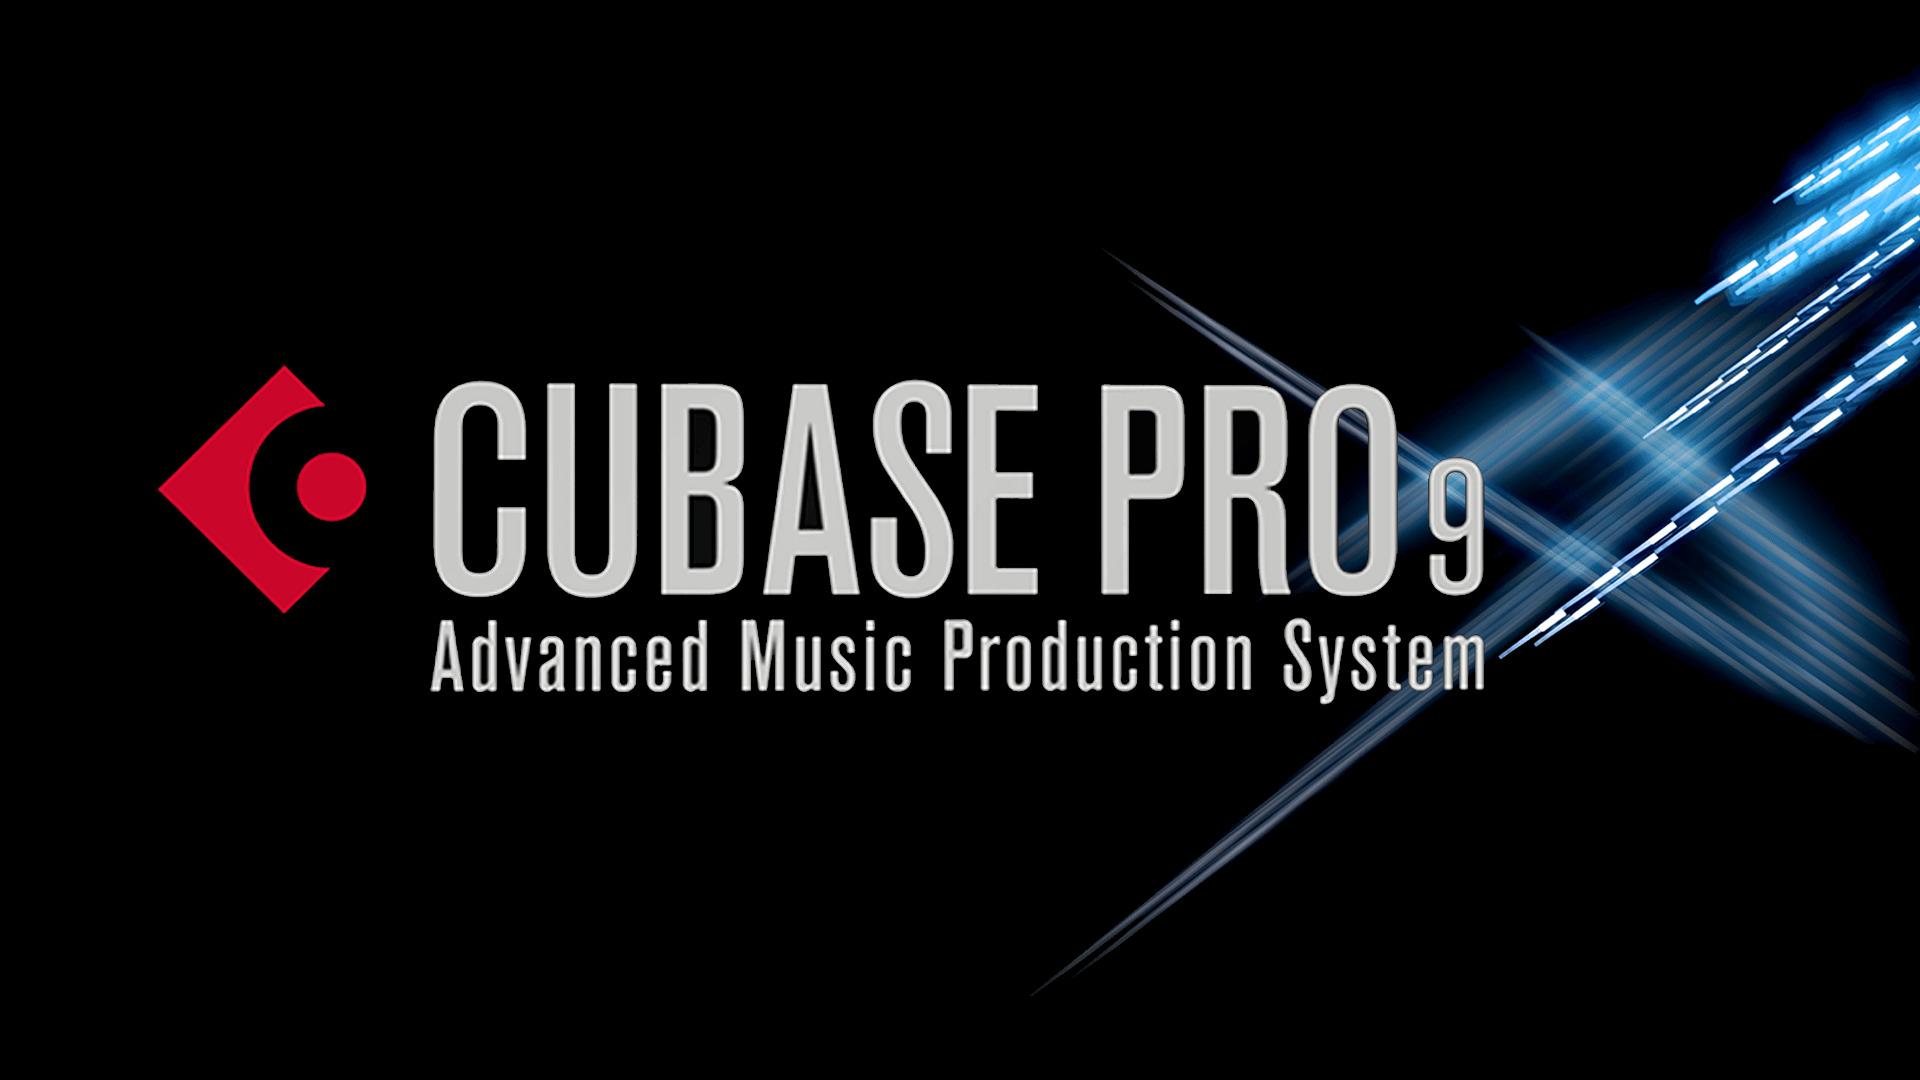 Workshop Cubase Pro 9 - Banner